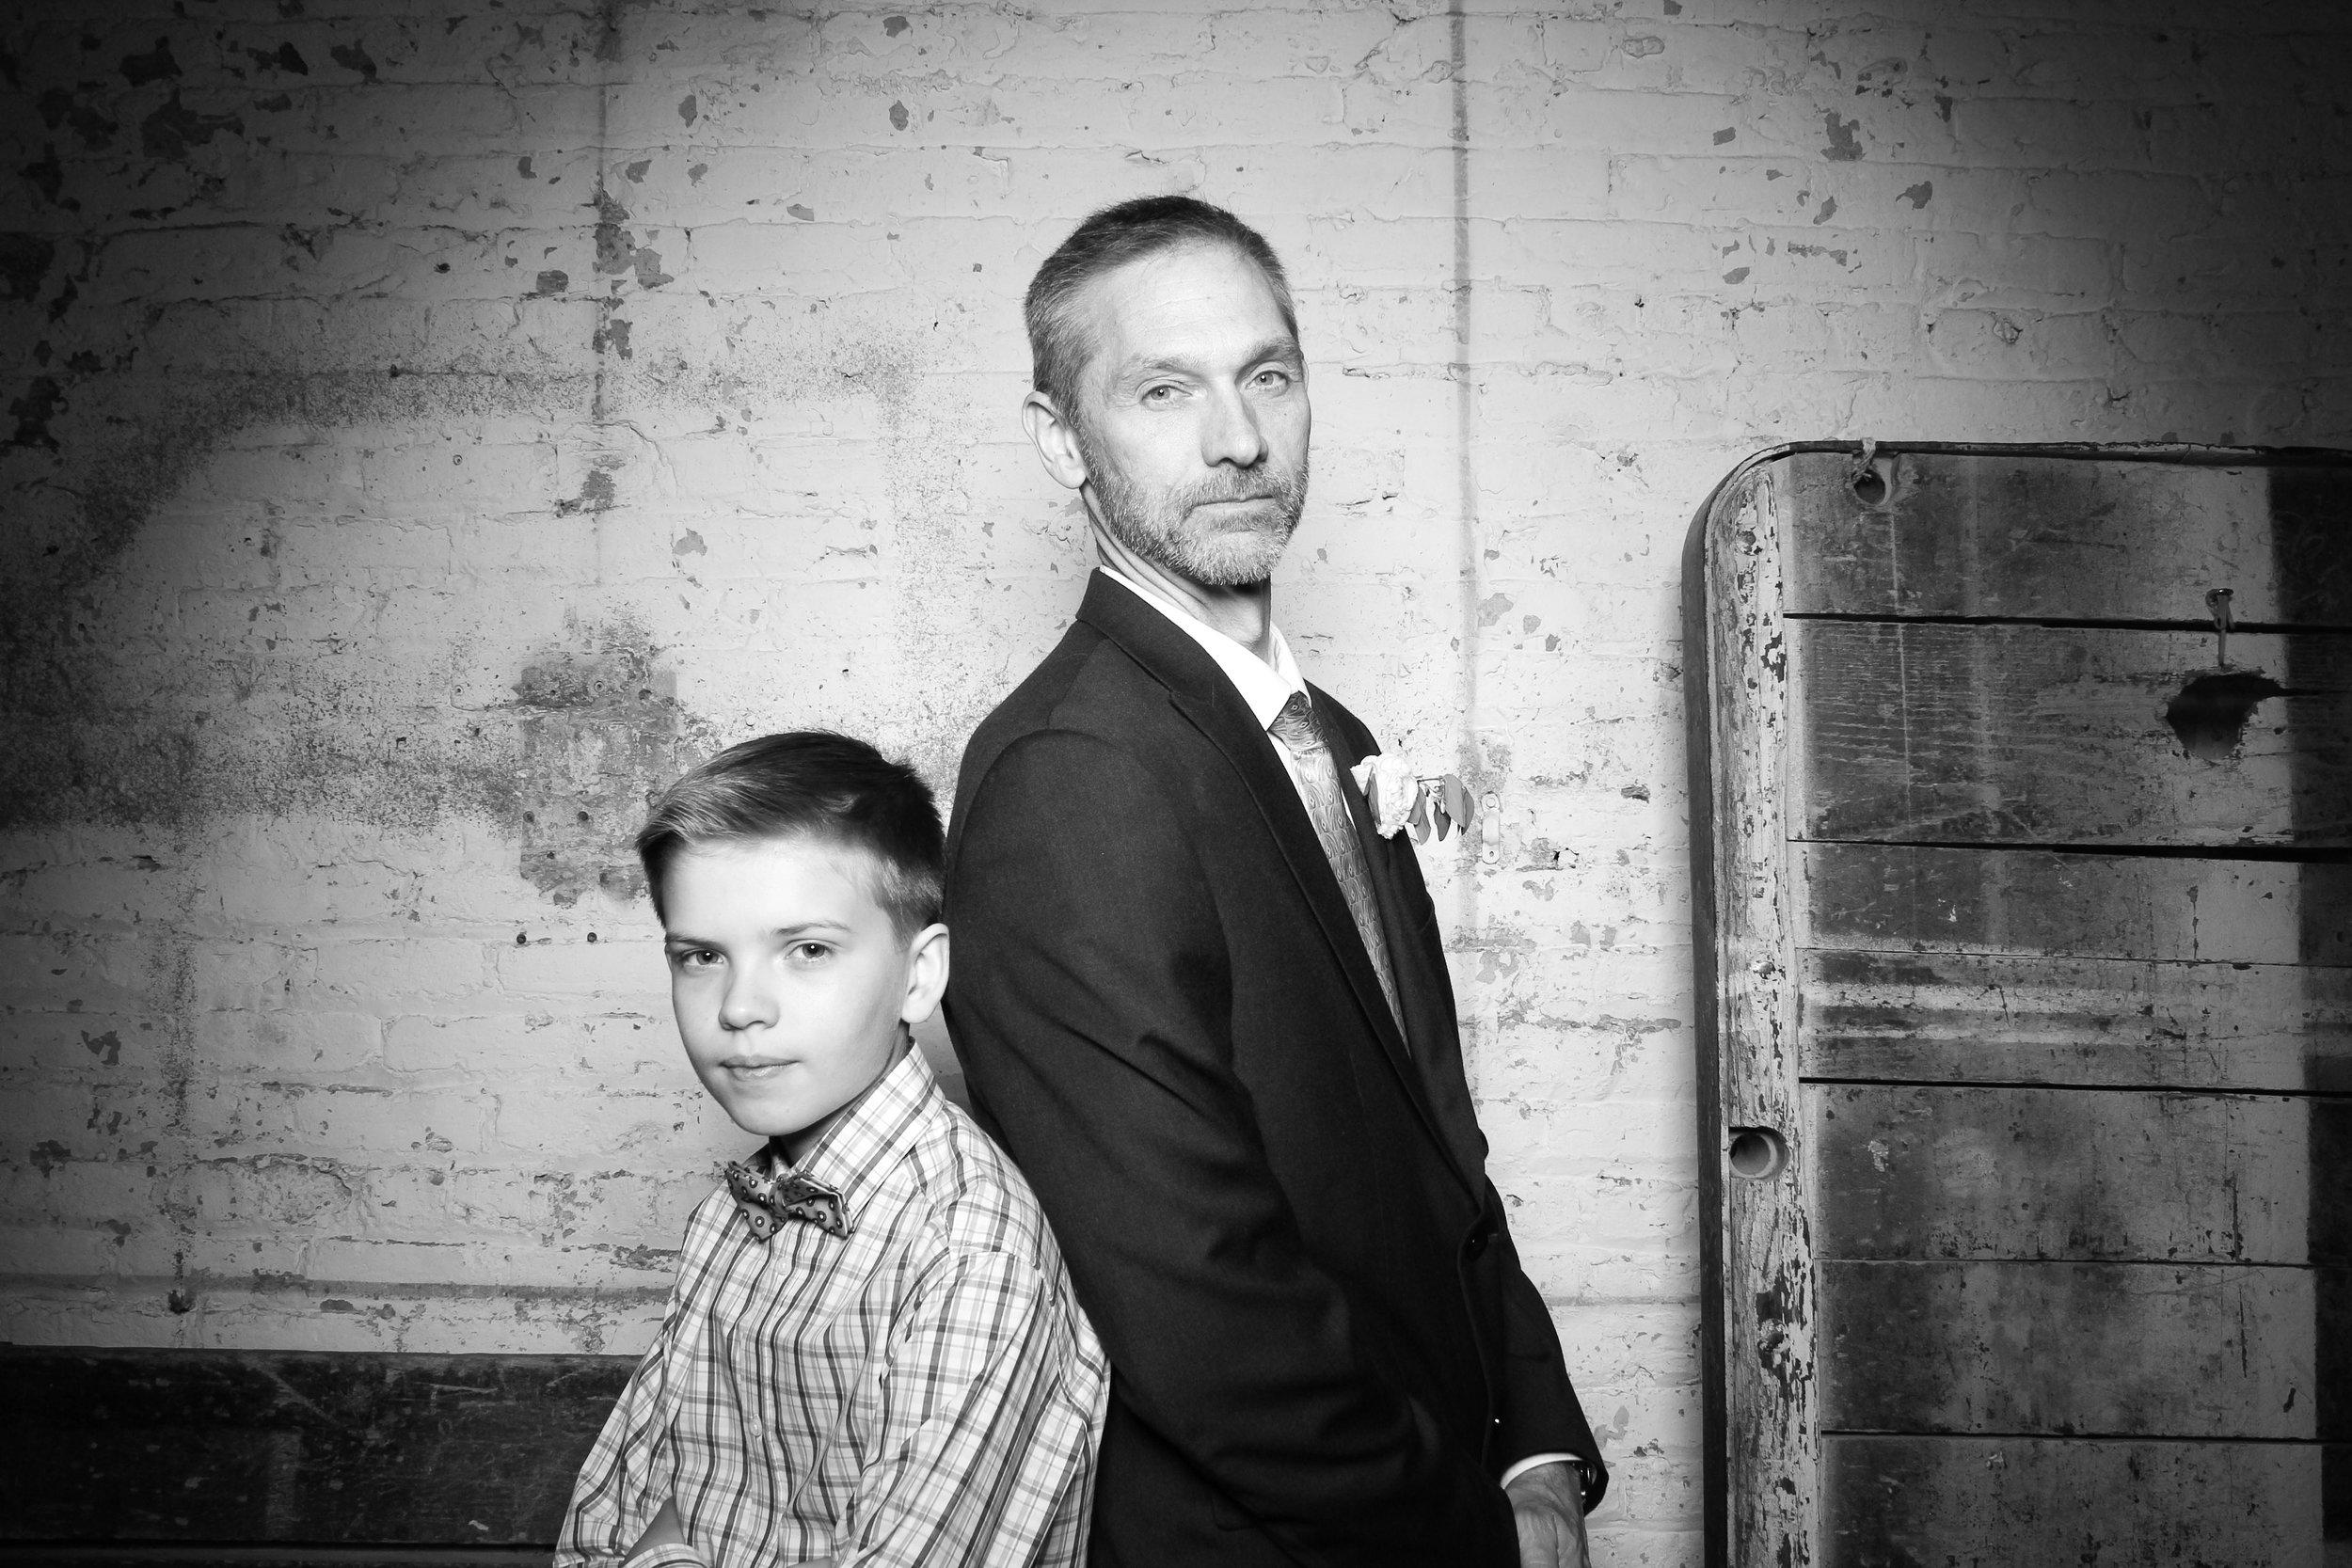 The_Joinery_Wedding_Venue_Logan_Square_Reception_17.jpg